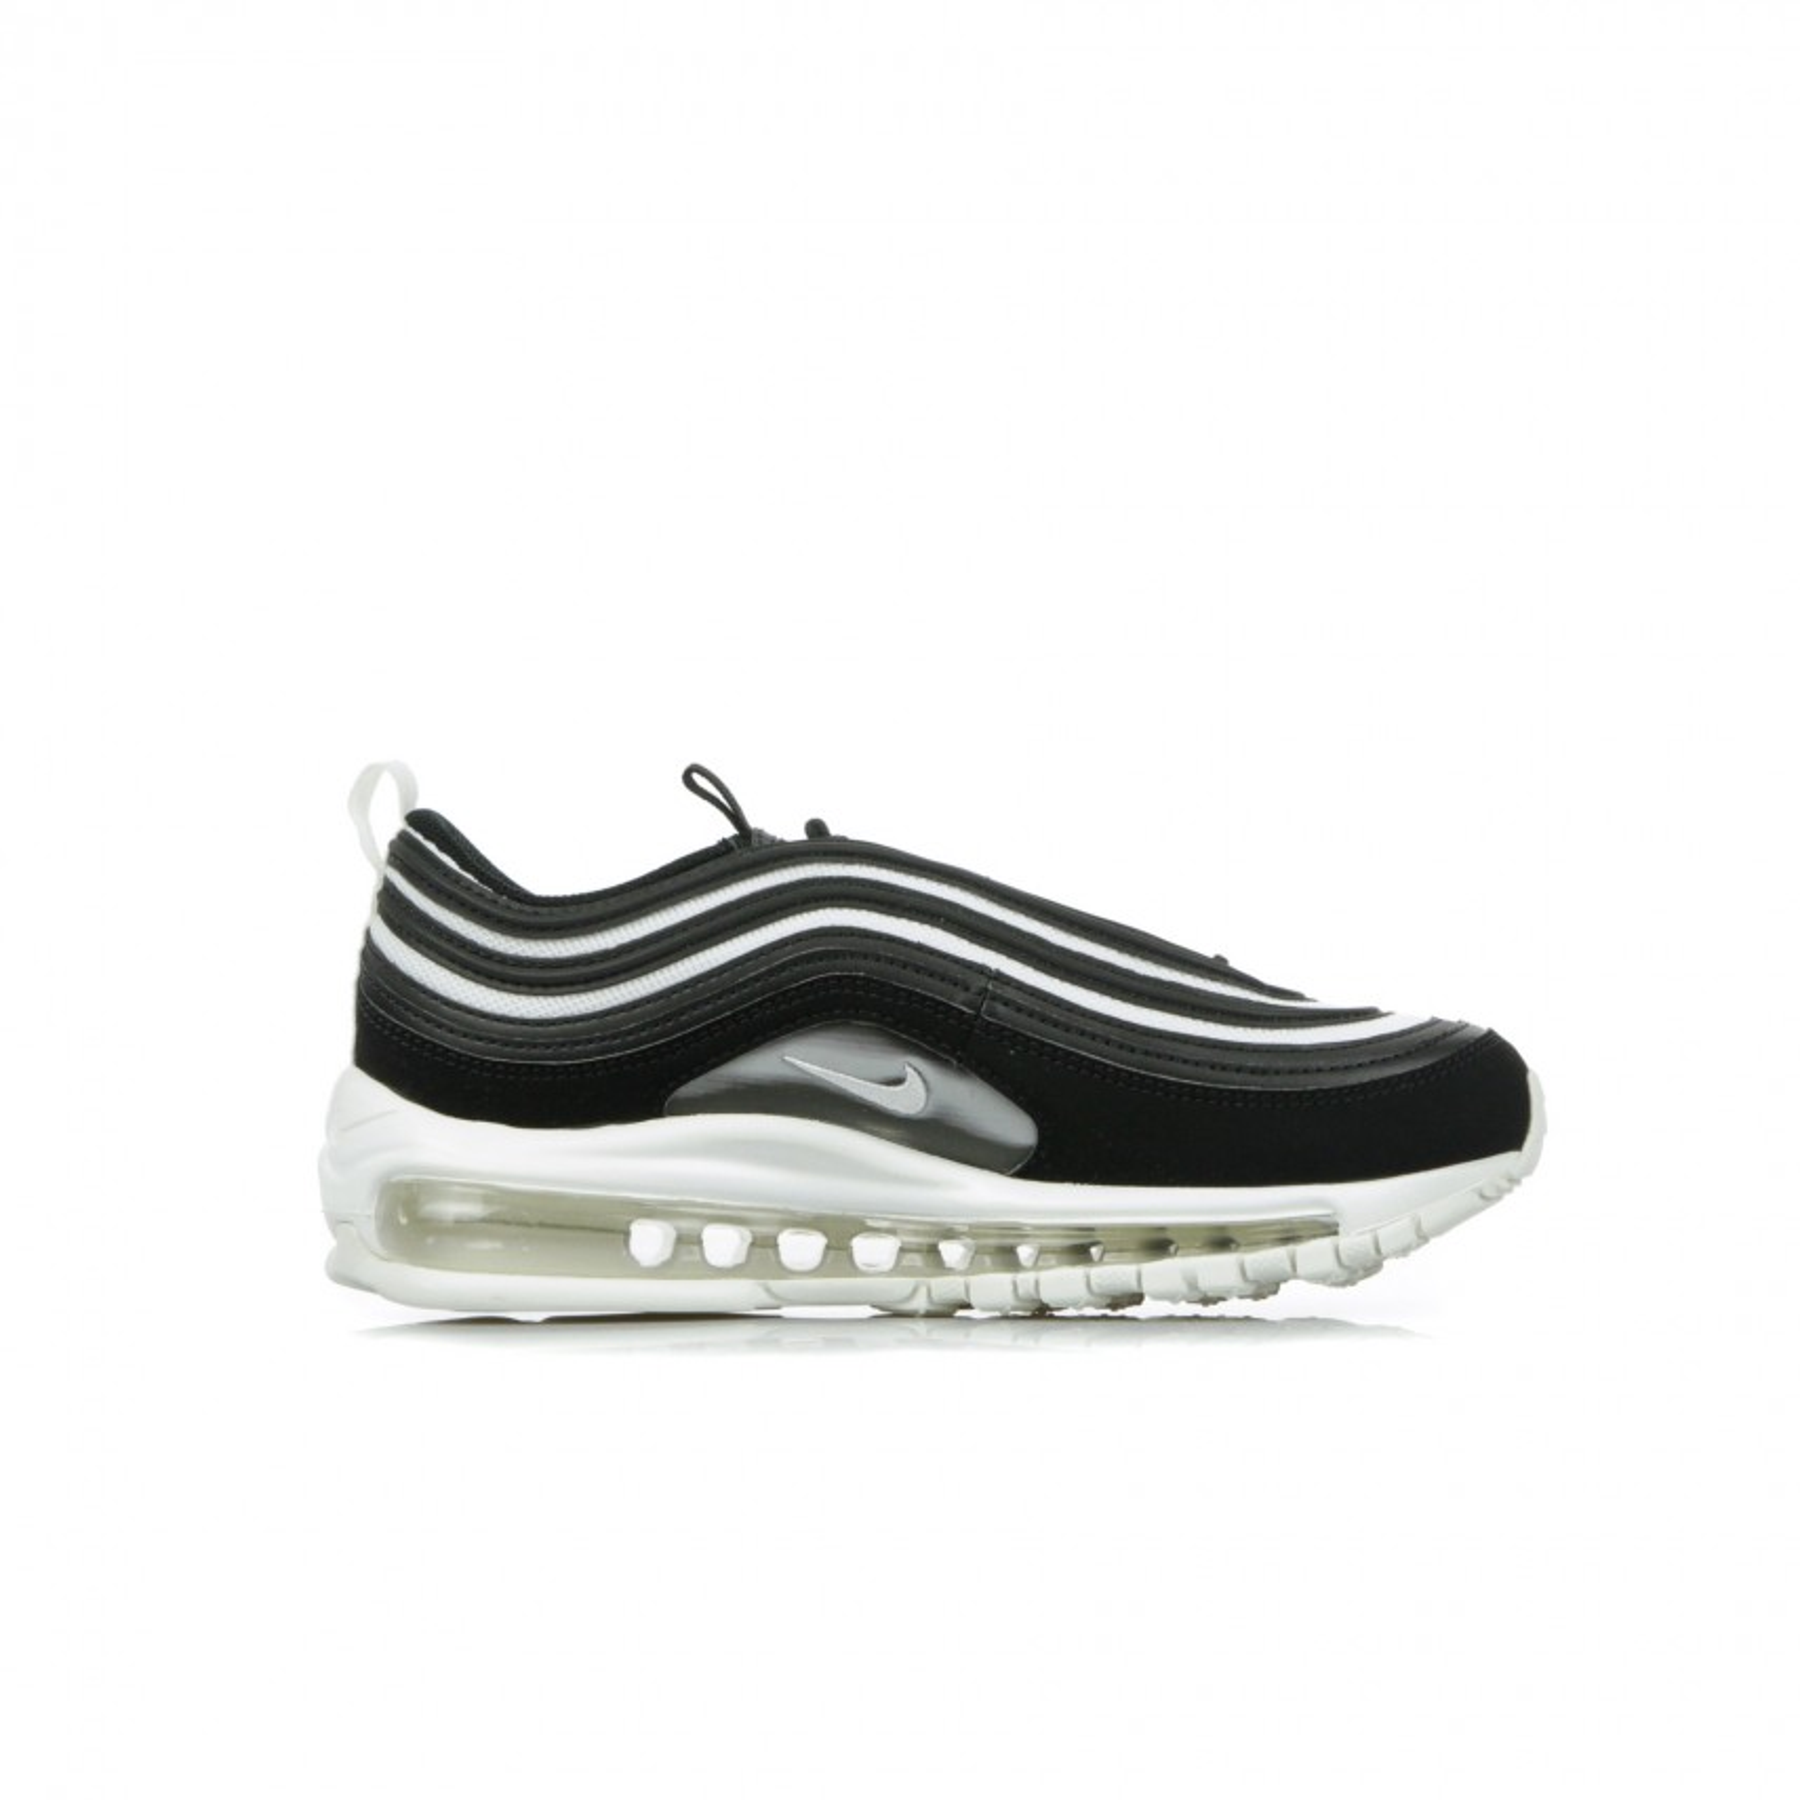 Nike Air Max 97 Black Platinum Tint White   921733 017